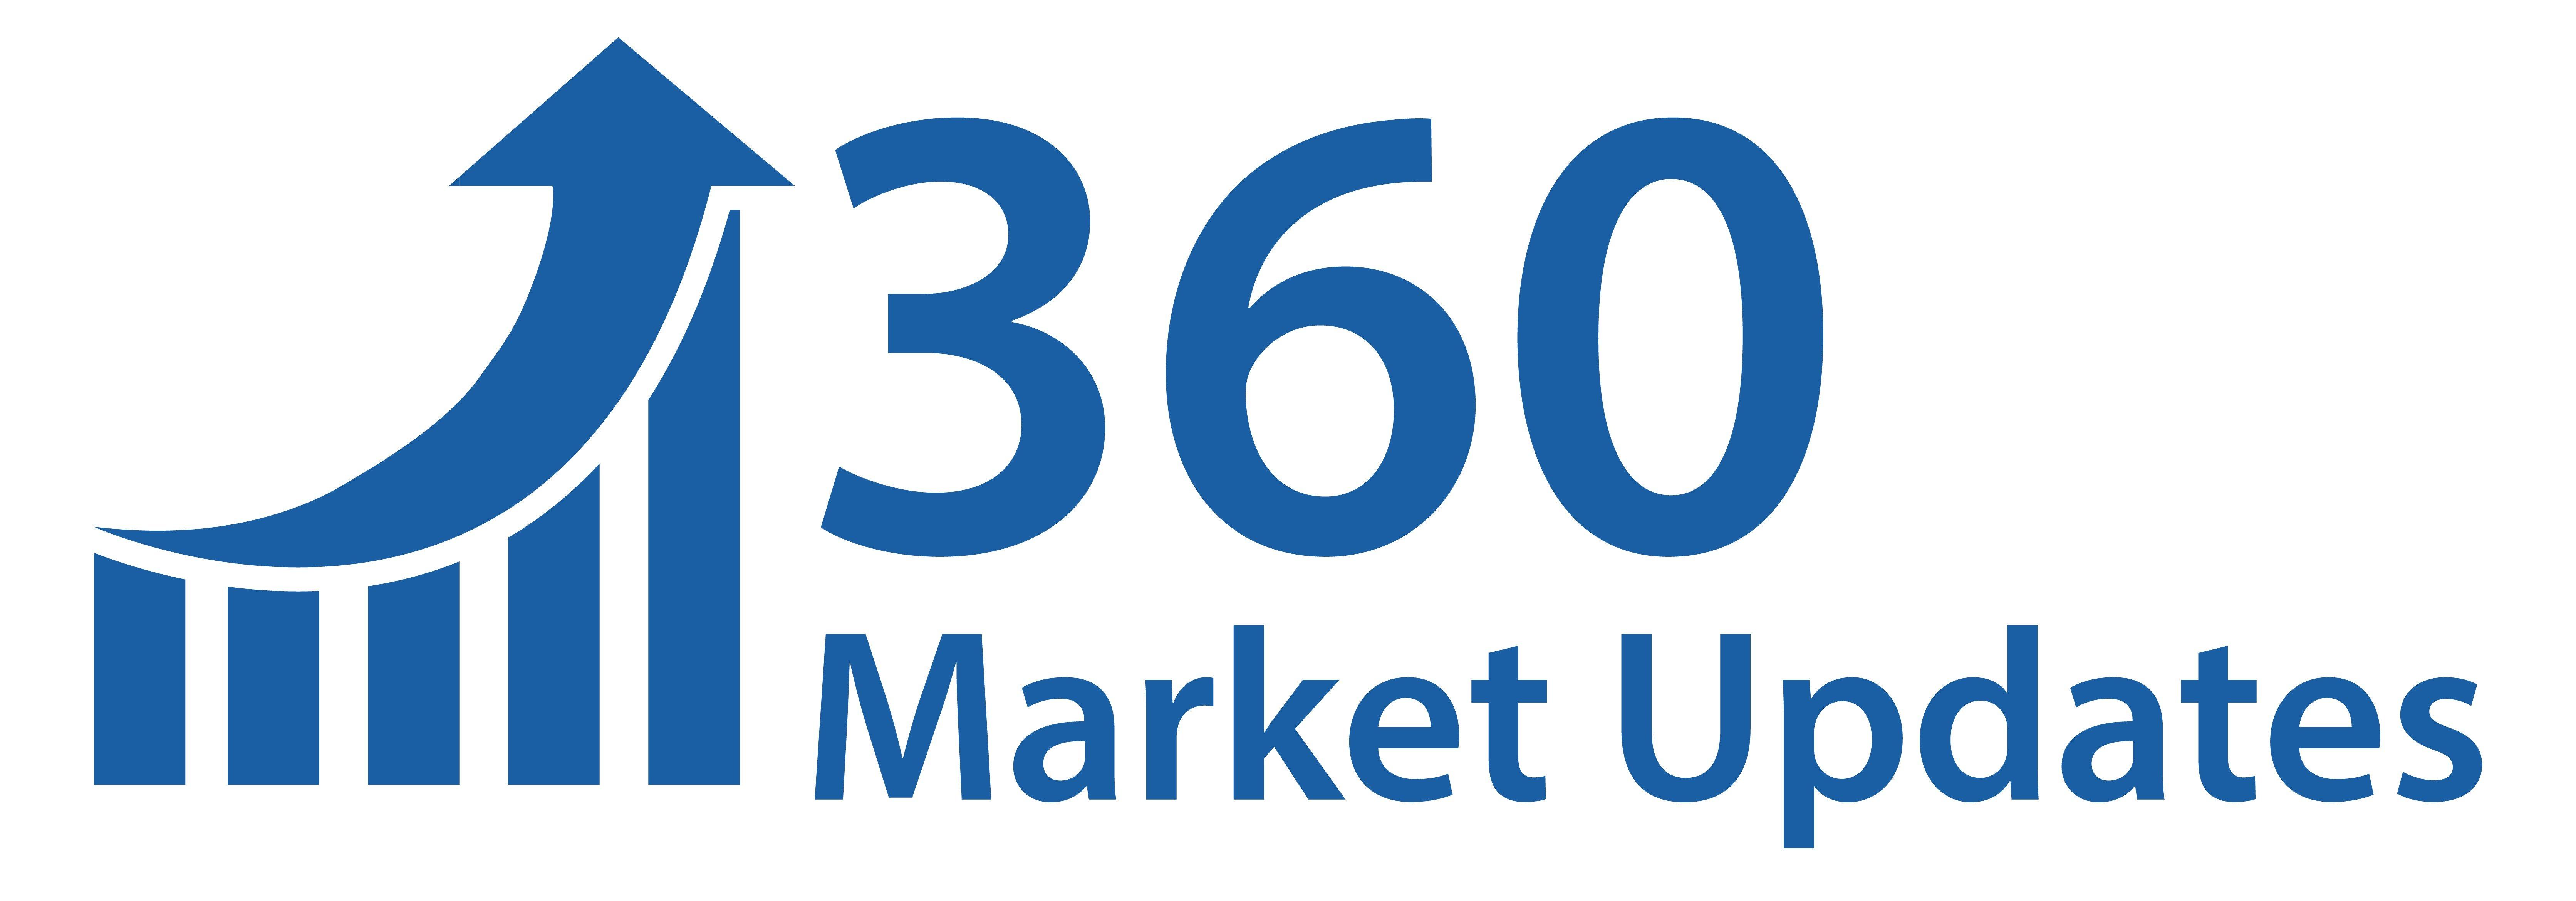 Ecu Calendar 2022.Automotive Ecu Market Size 2021 Provides Exclusive Vital Statist Wicz